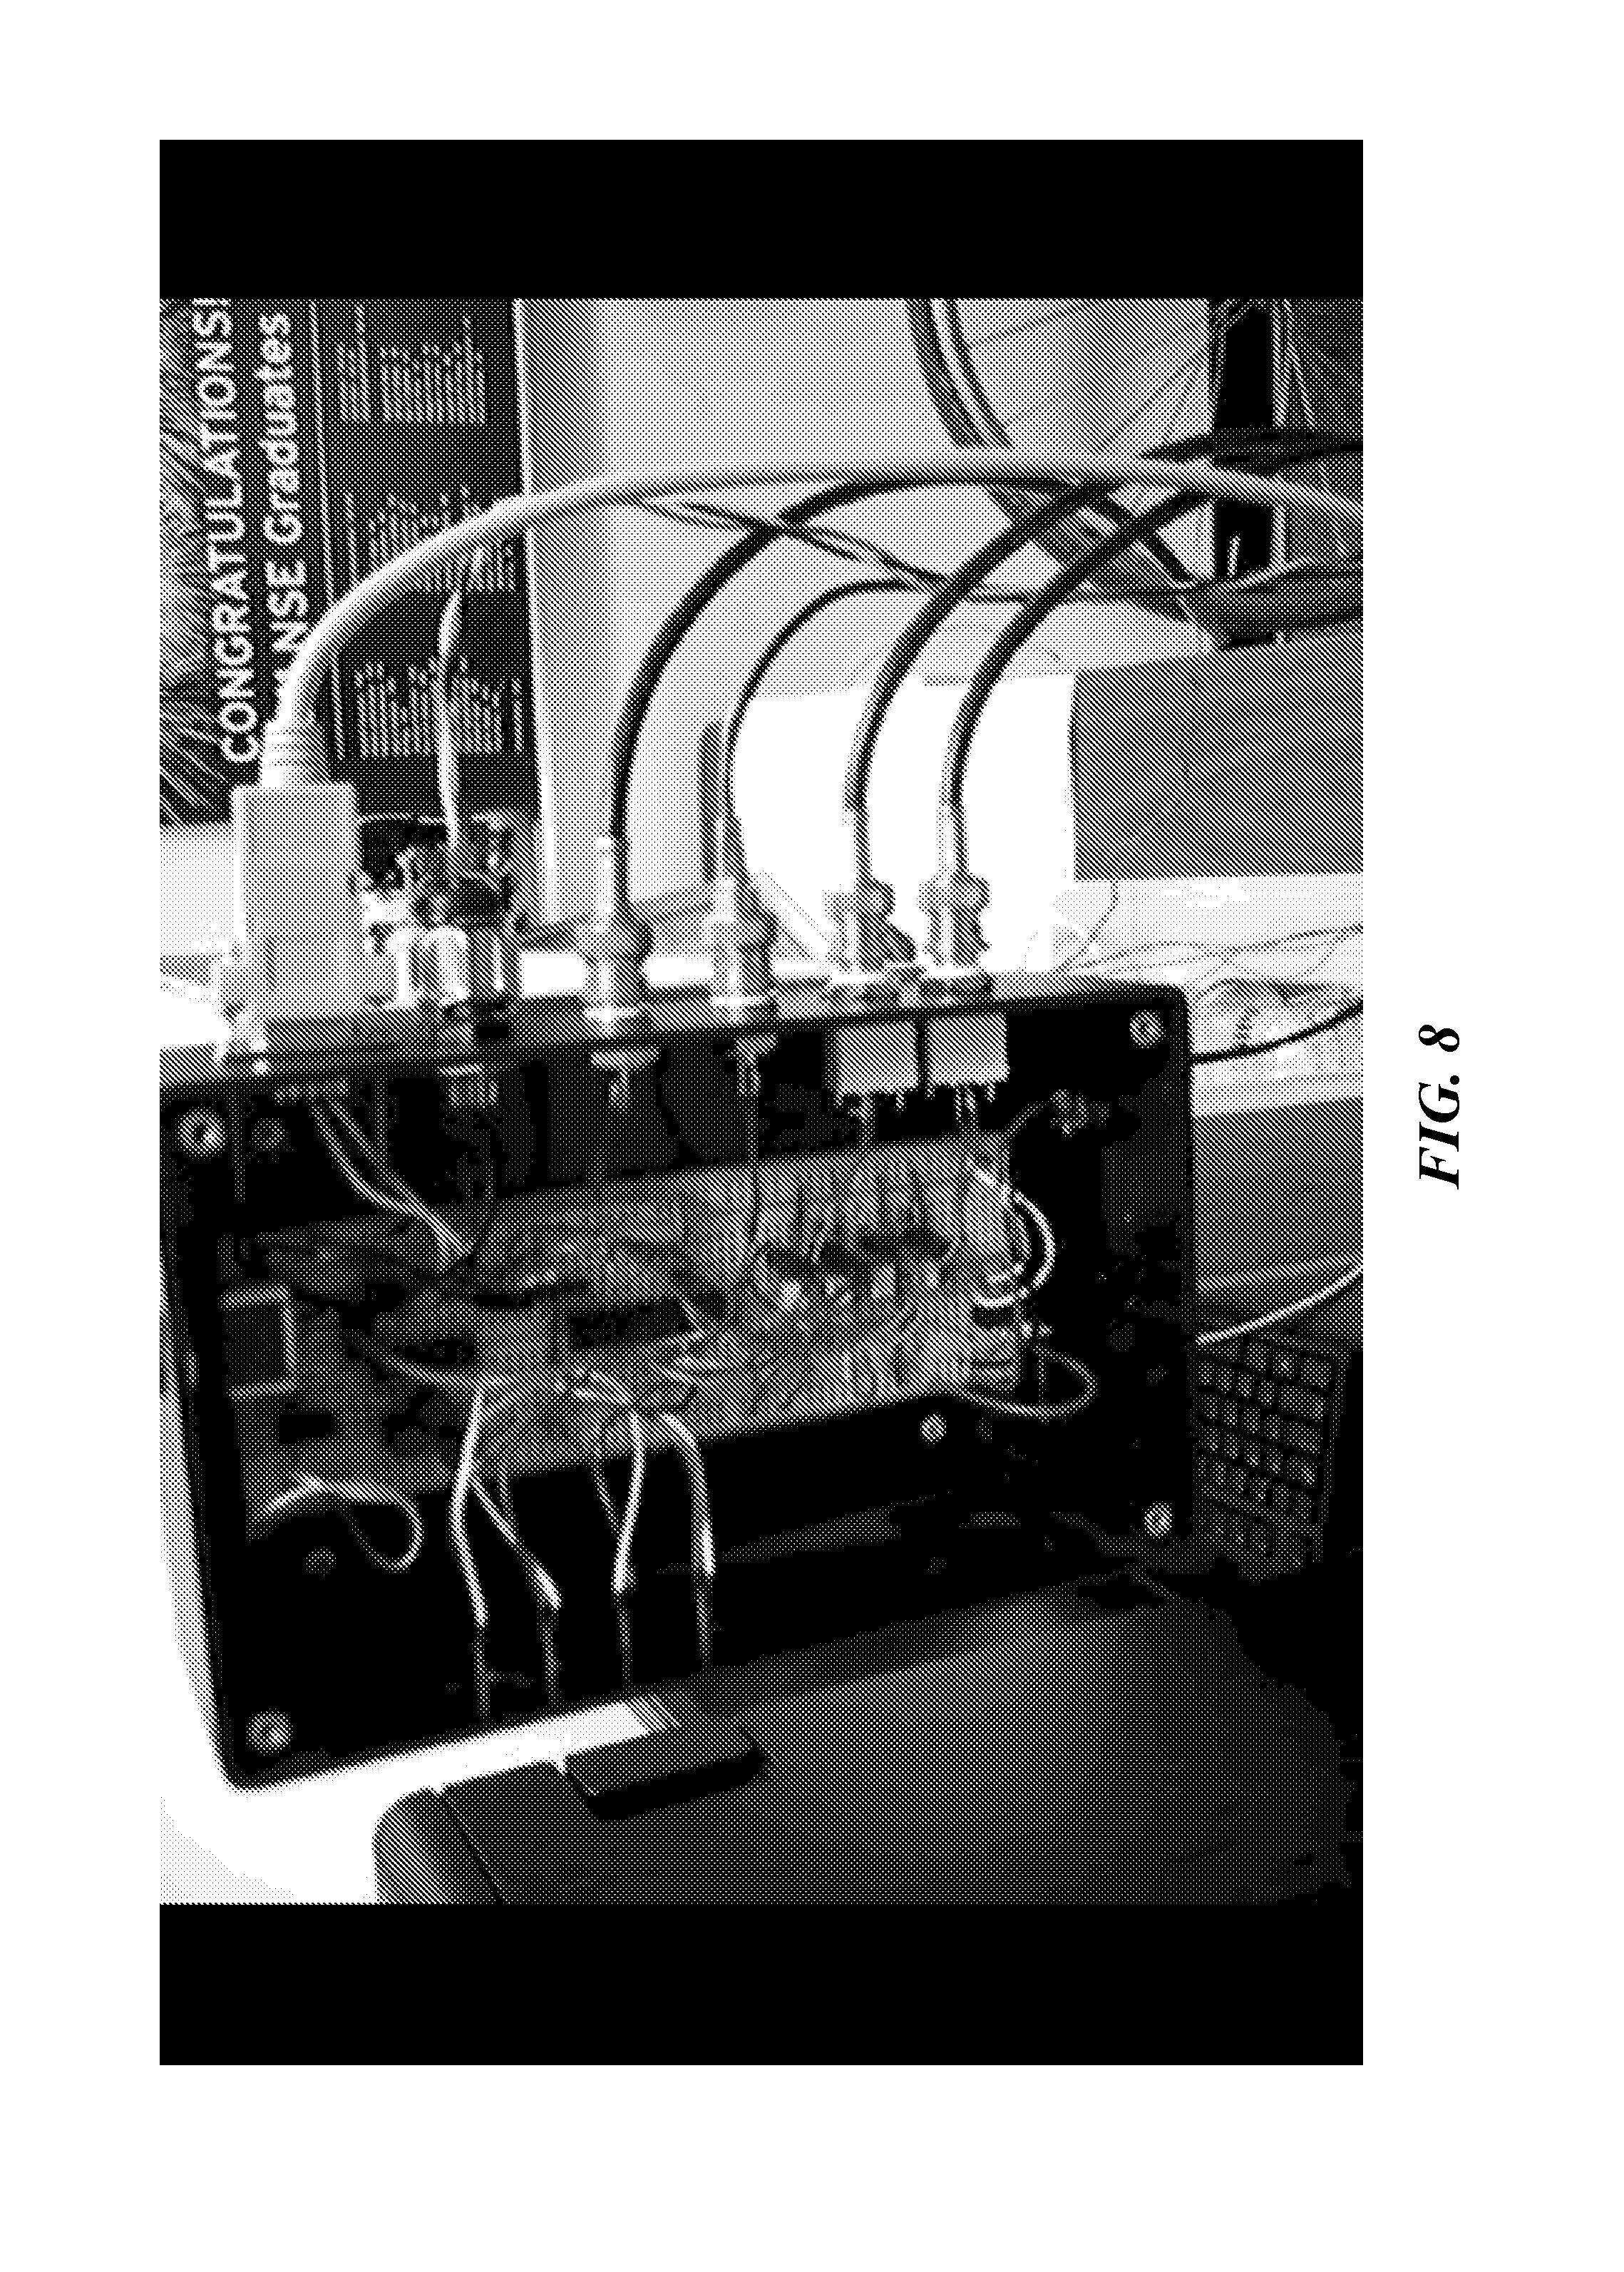 spherification machine